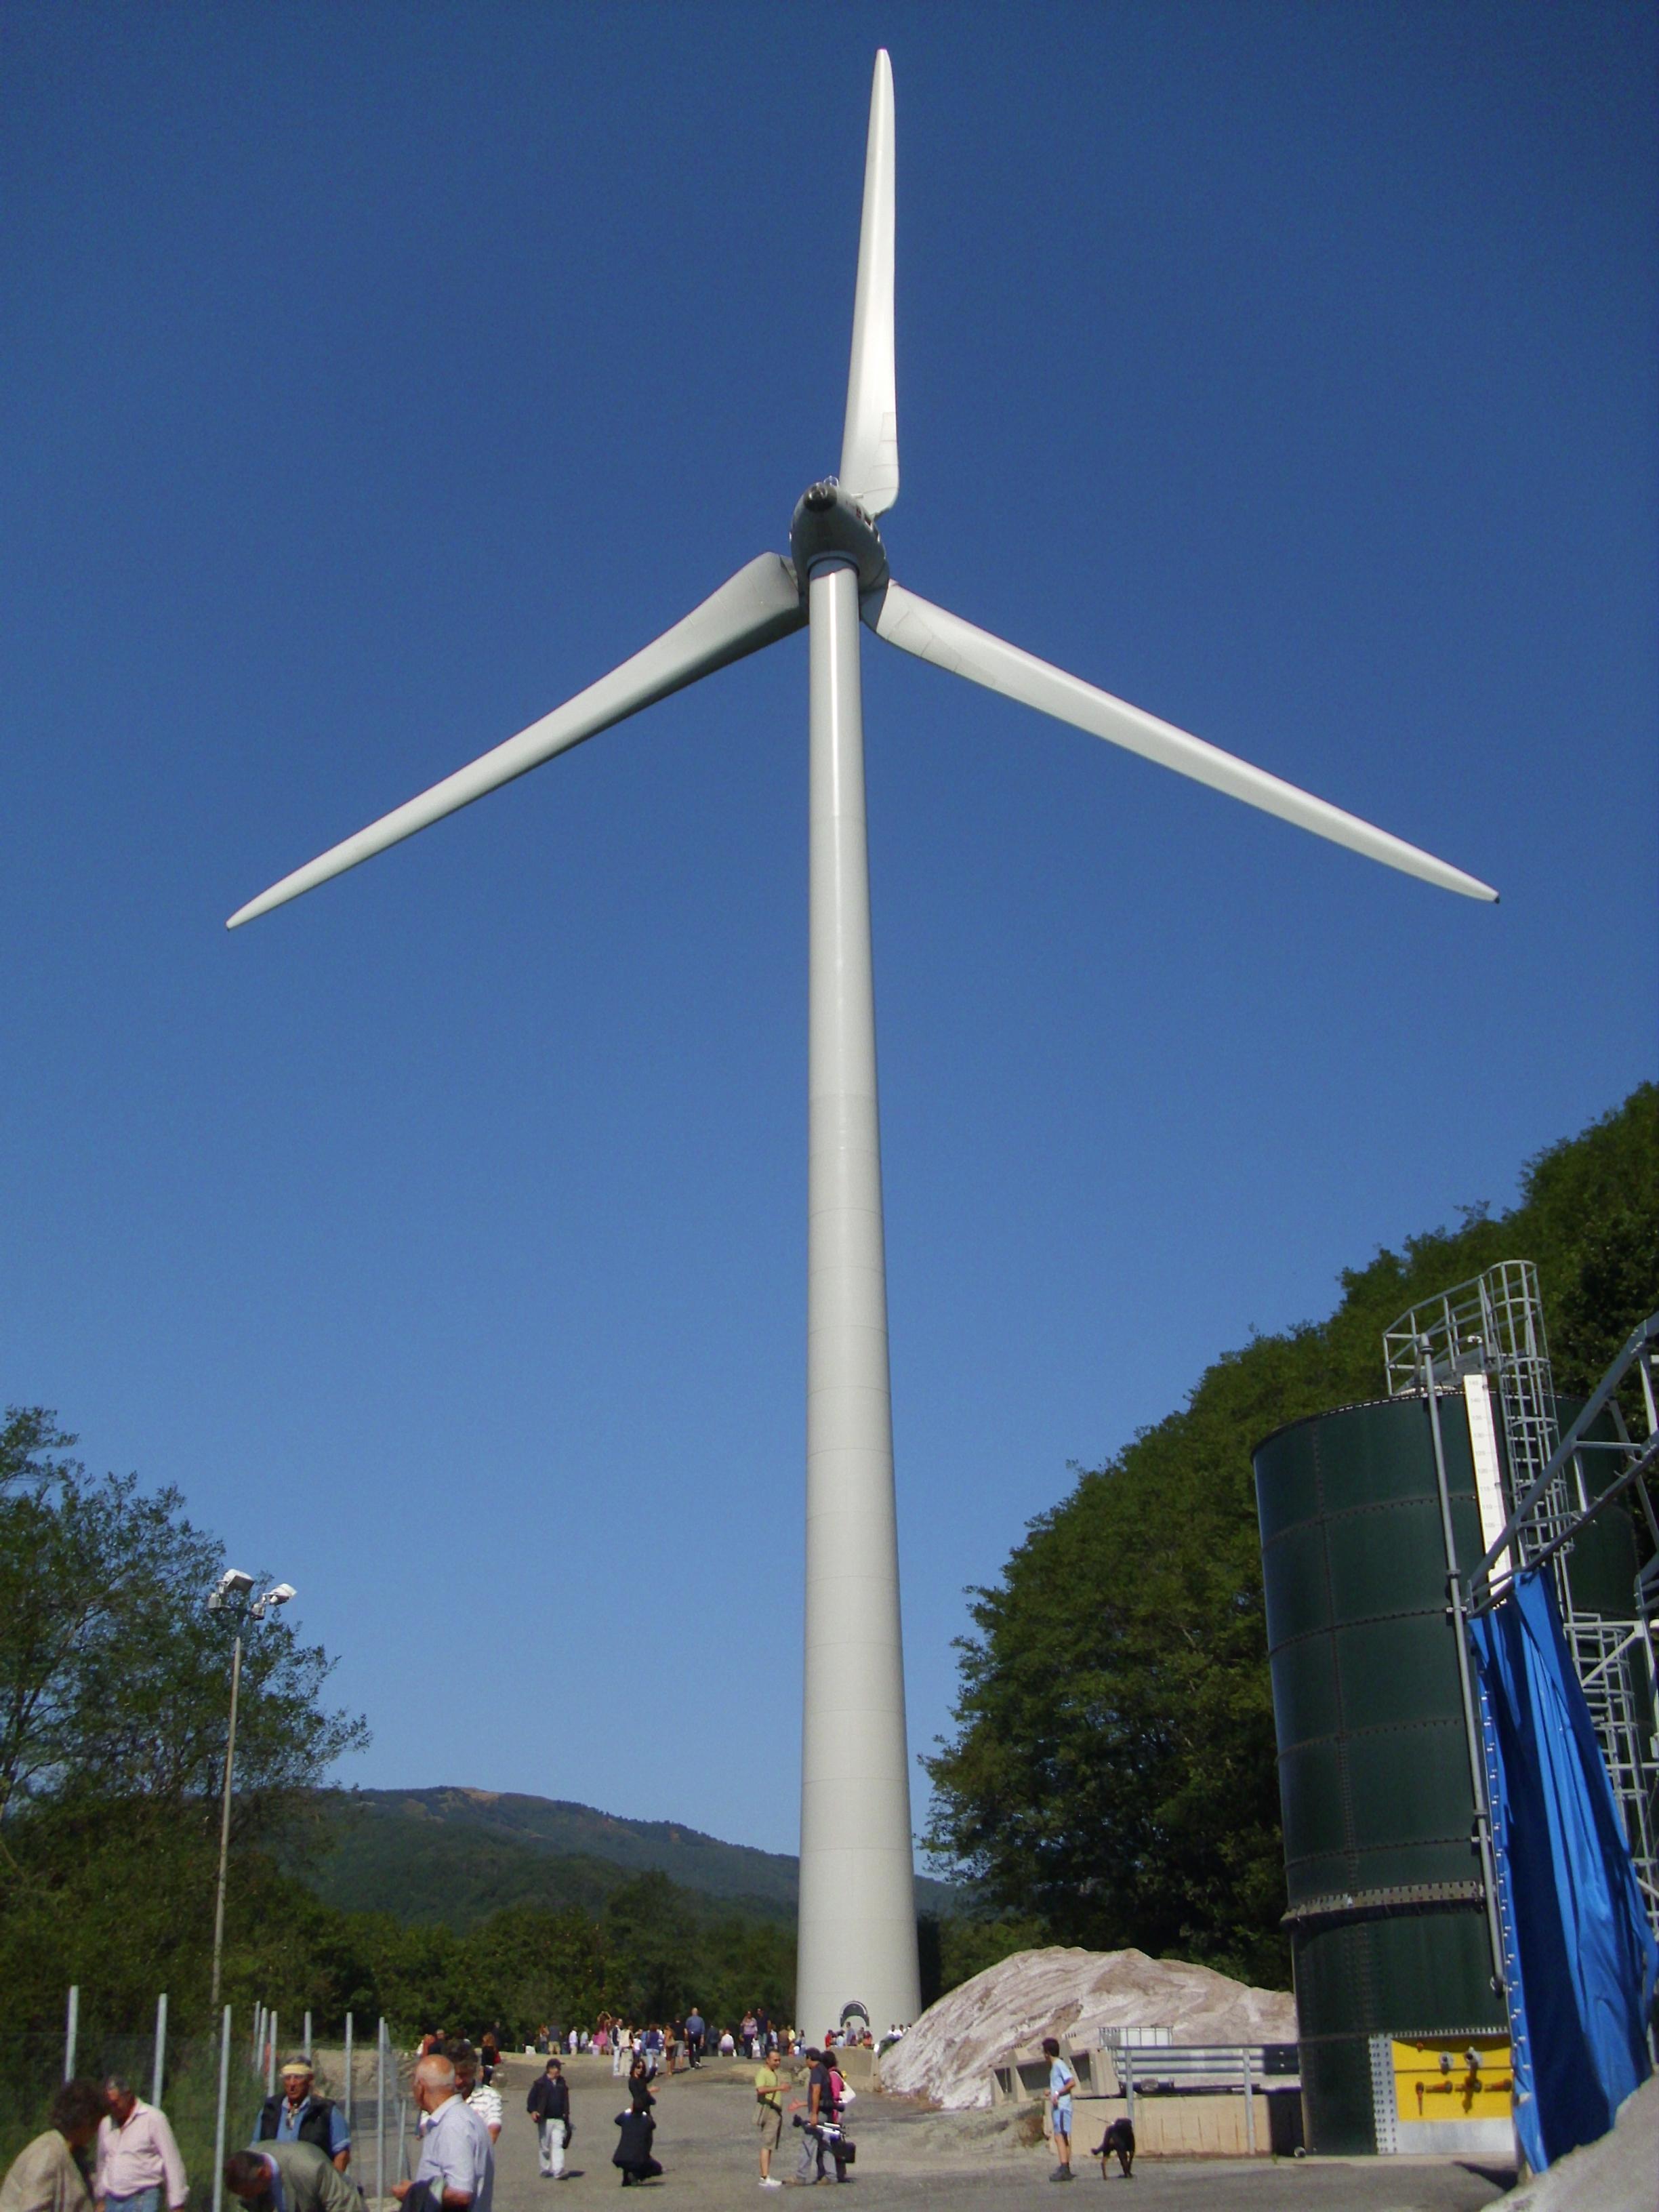 File:Pala eolica Mele 16.jpg - Wikimedia Commons